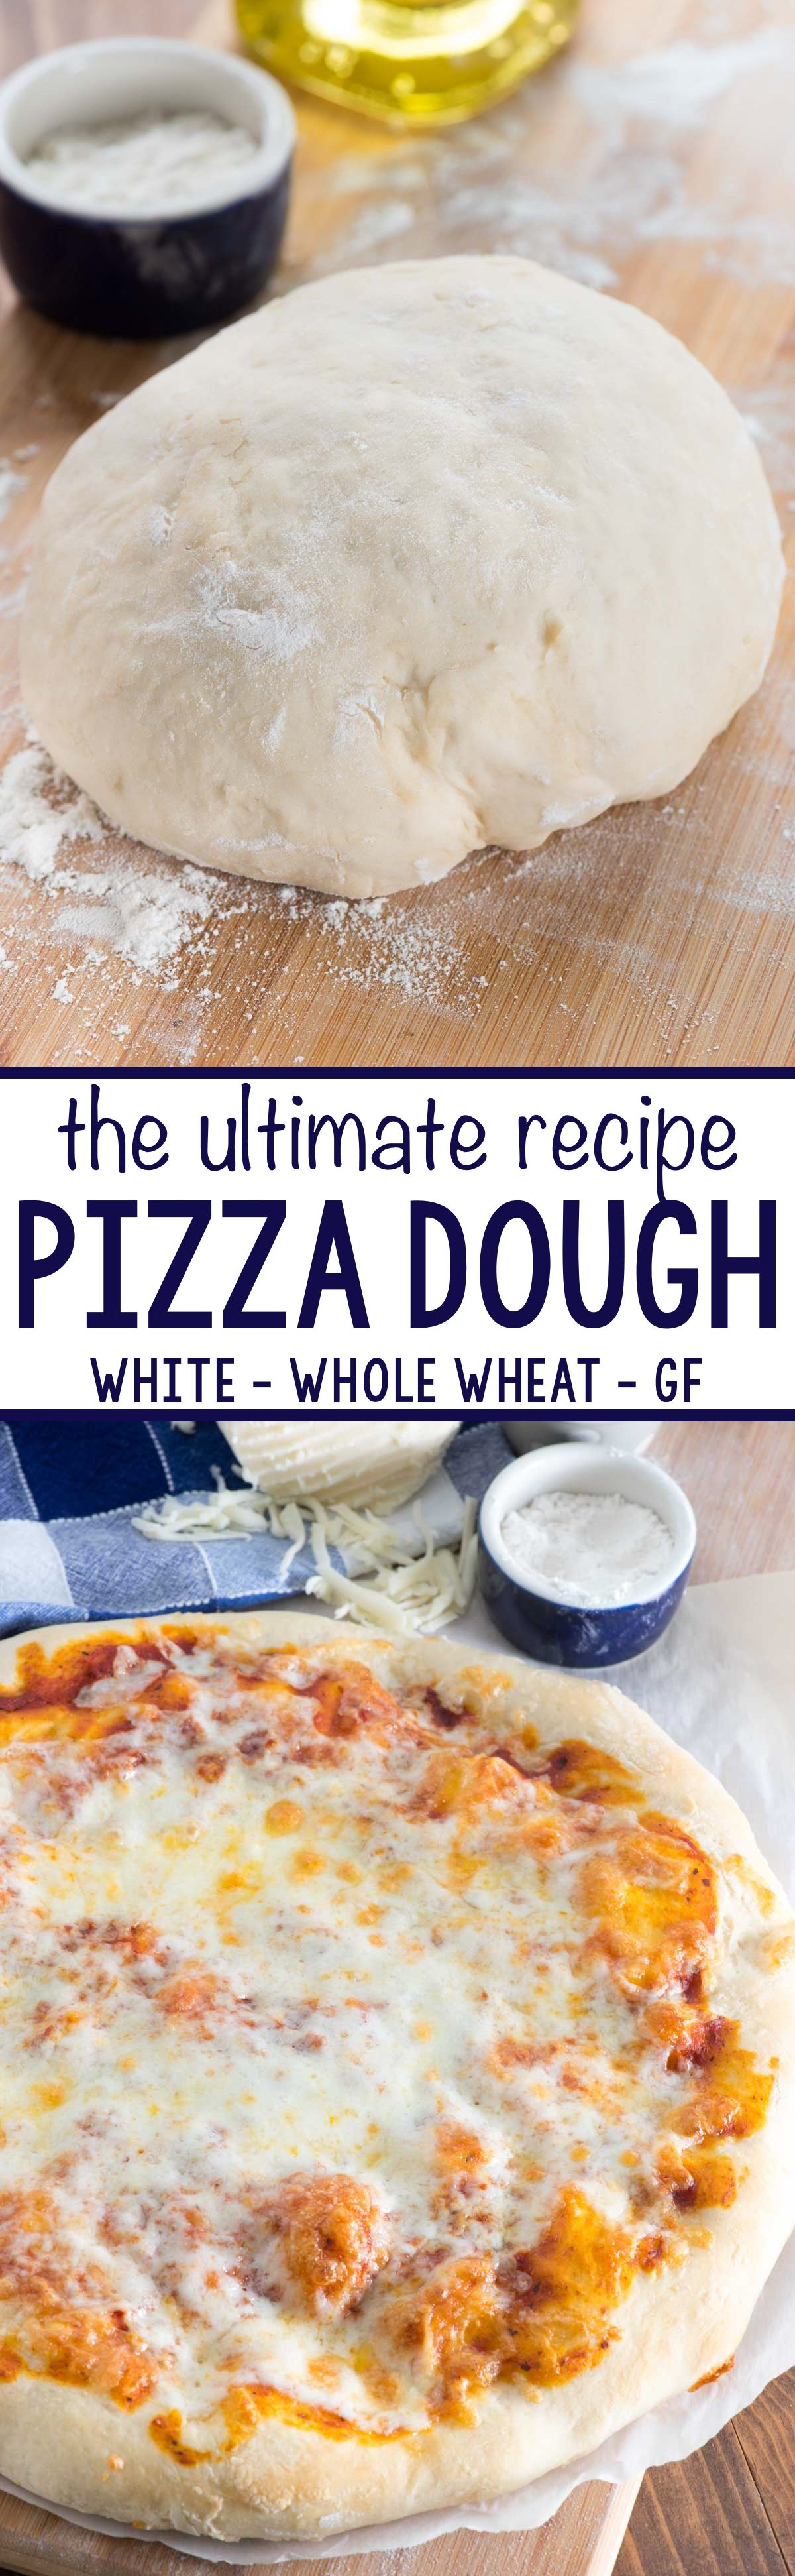 The Ultimate Pizza Dough Recipe Food Recipes Ultimate